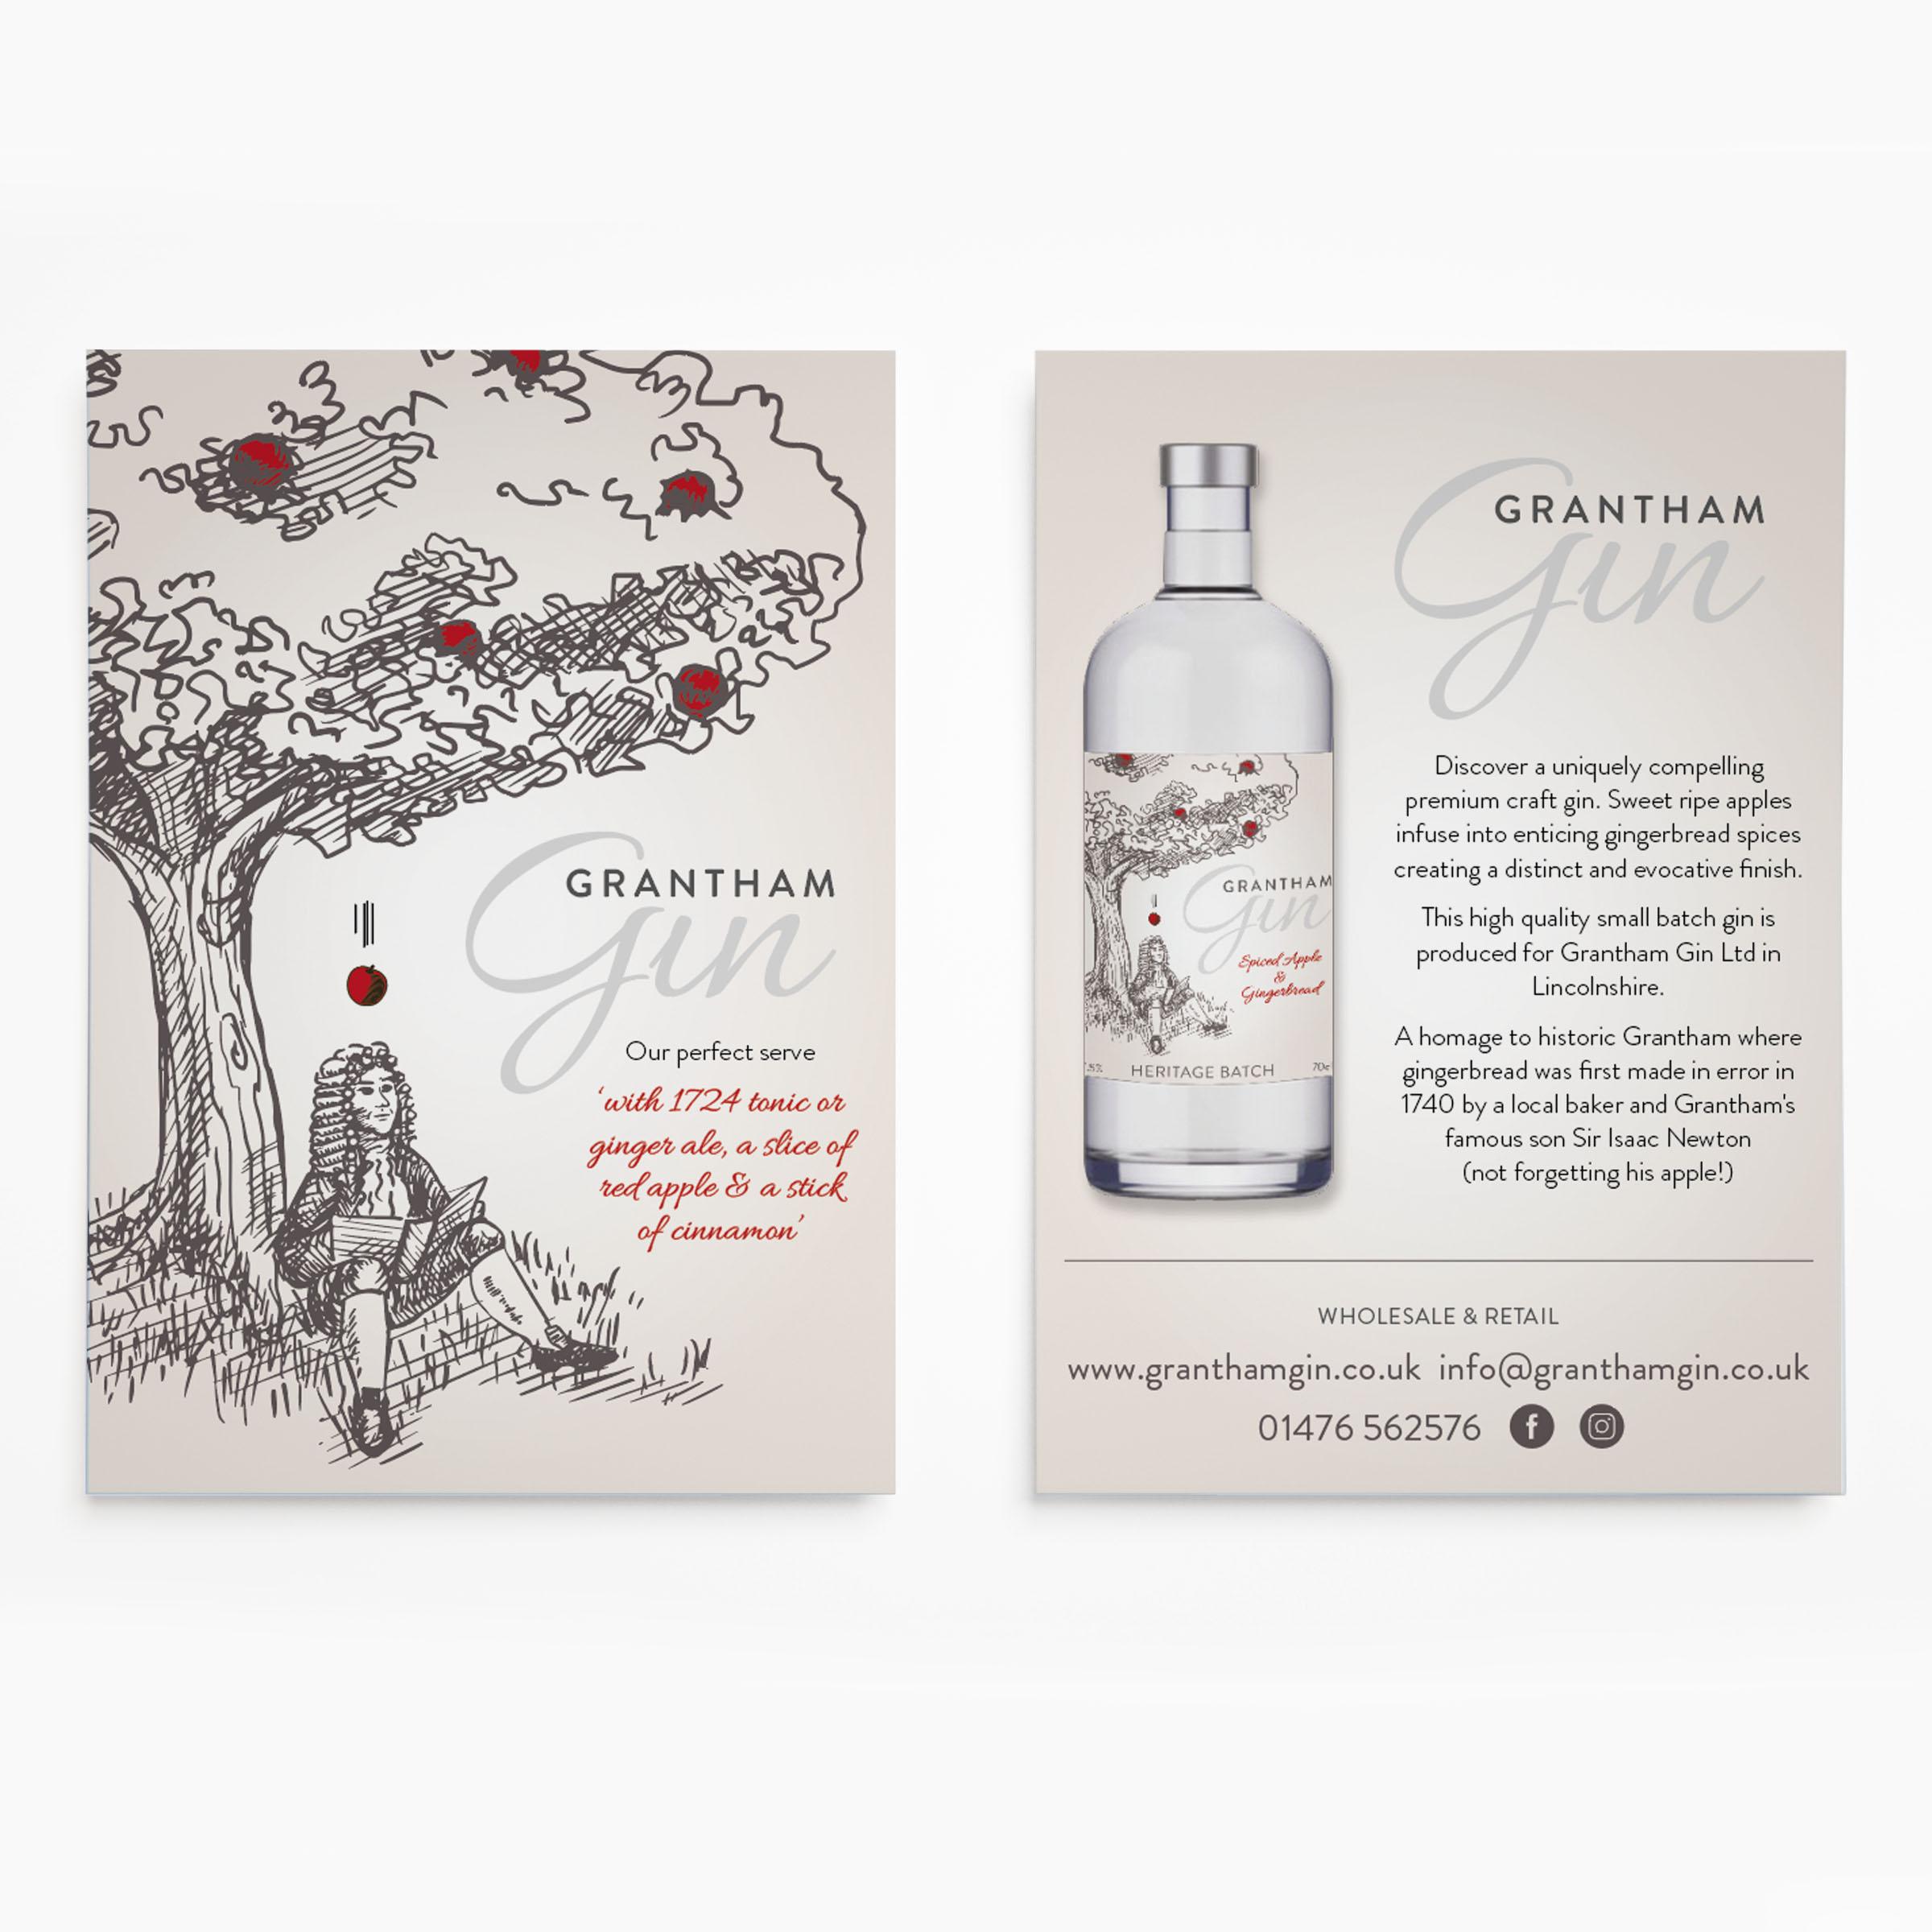 https://micheledonnison.co.uk/wp-content/uploads/2018/06/Grantham-Gin-A5-Leaflet_proof_01.jpg